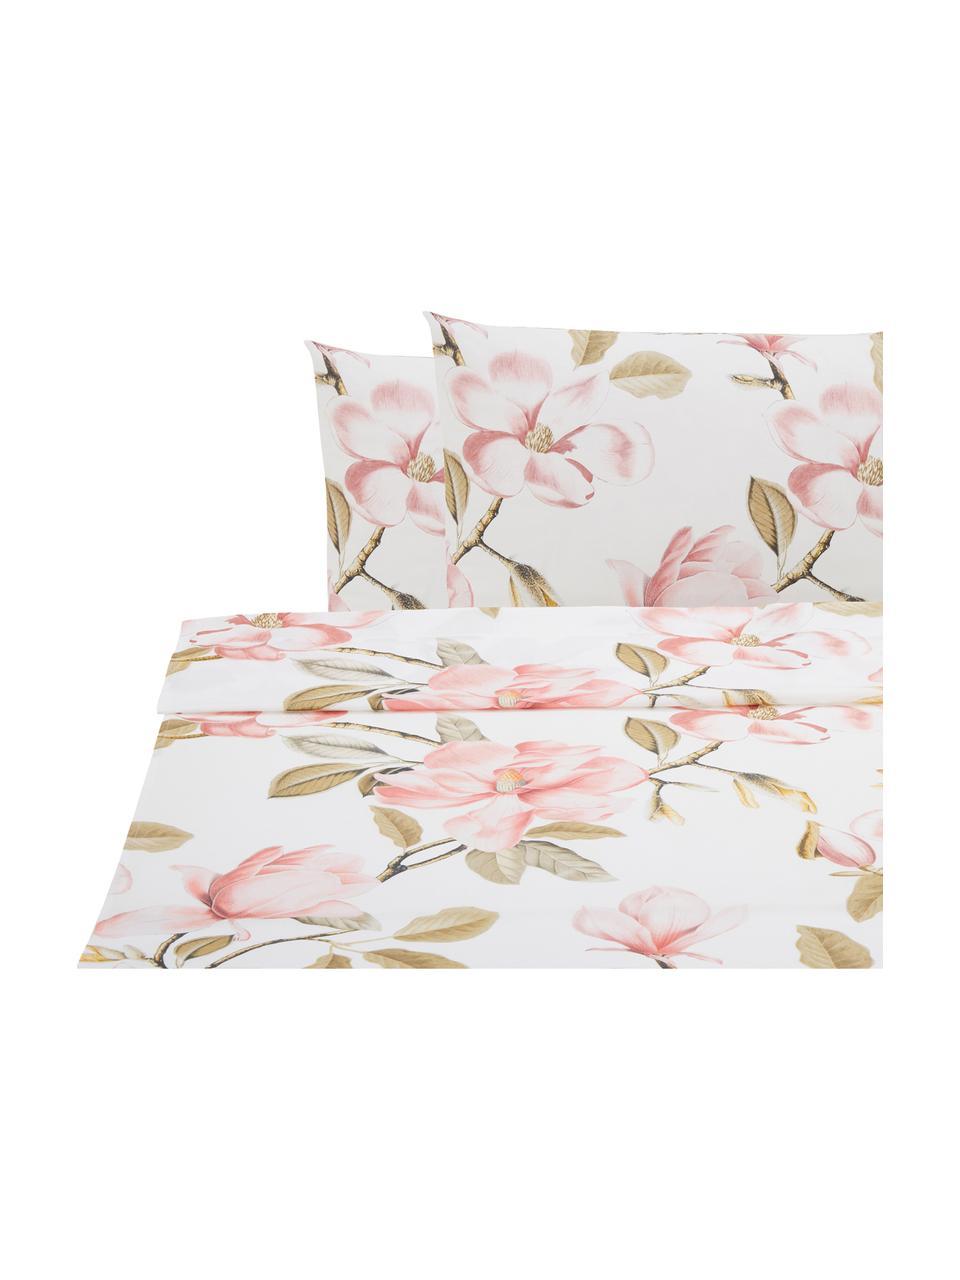 Set lenzuola in cotone Magnolia, Bianco, rosa, verde, 240 x 270 cm + 2 federe 50 x 75 cm